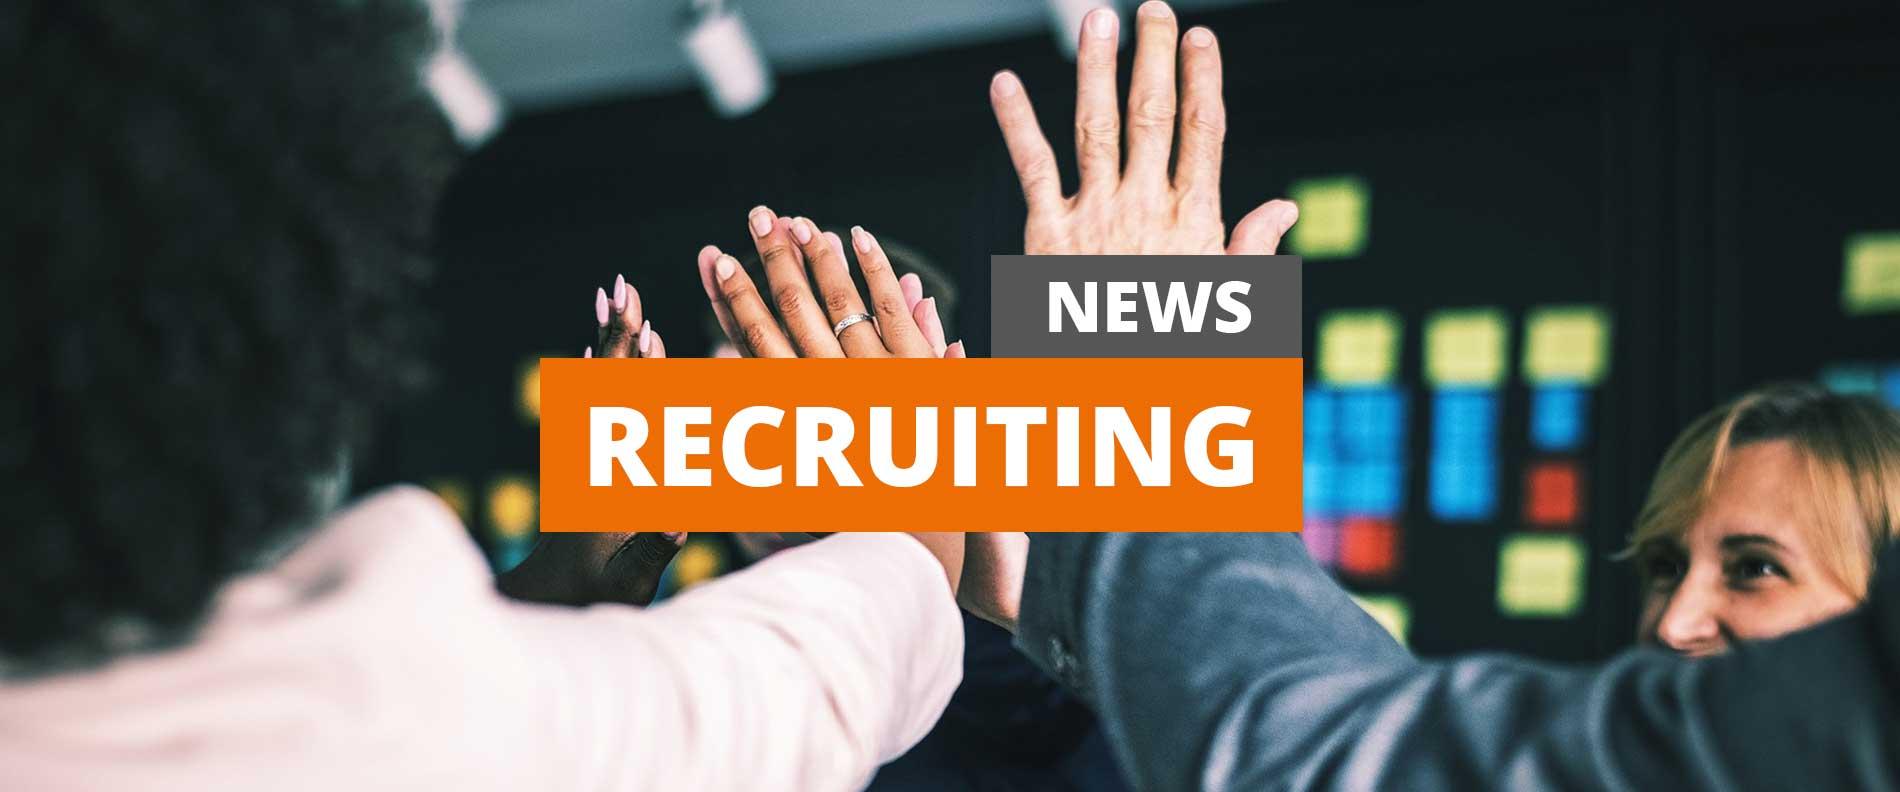 recruiting-news_18.1.19